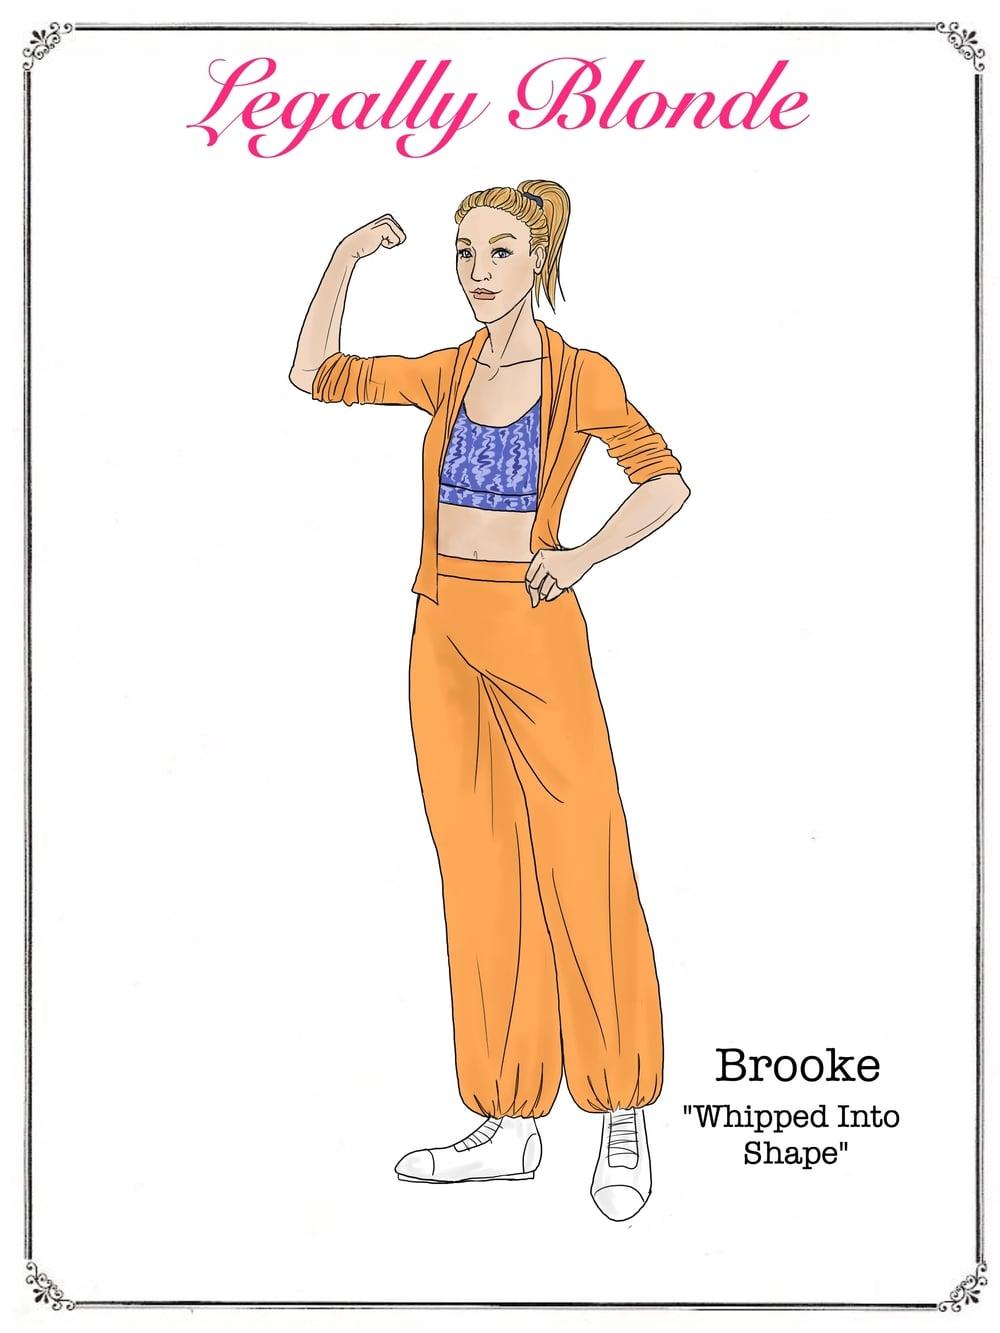 LB_Brooke1.jpg